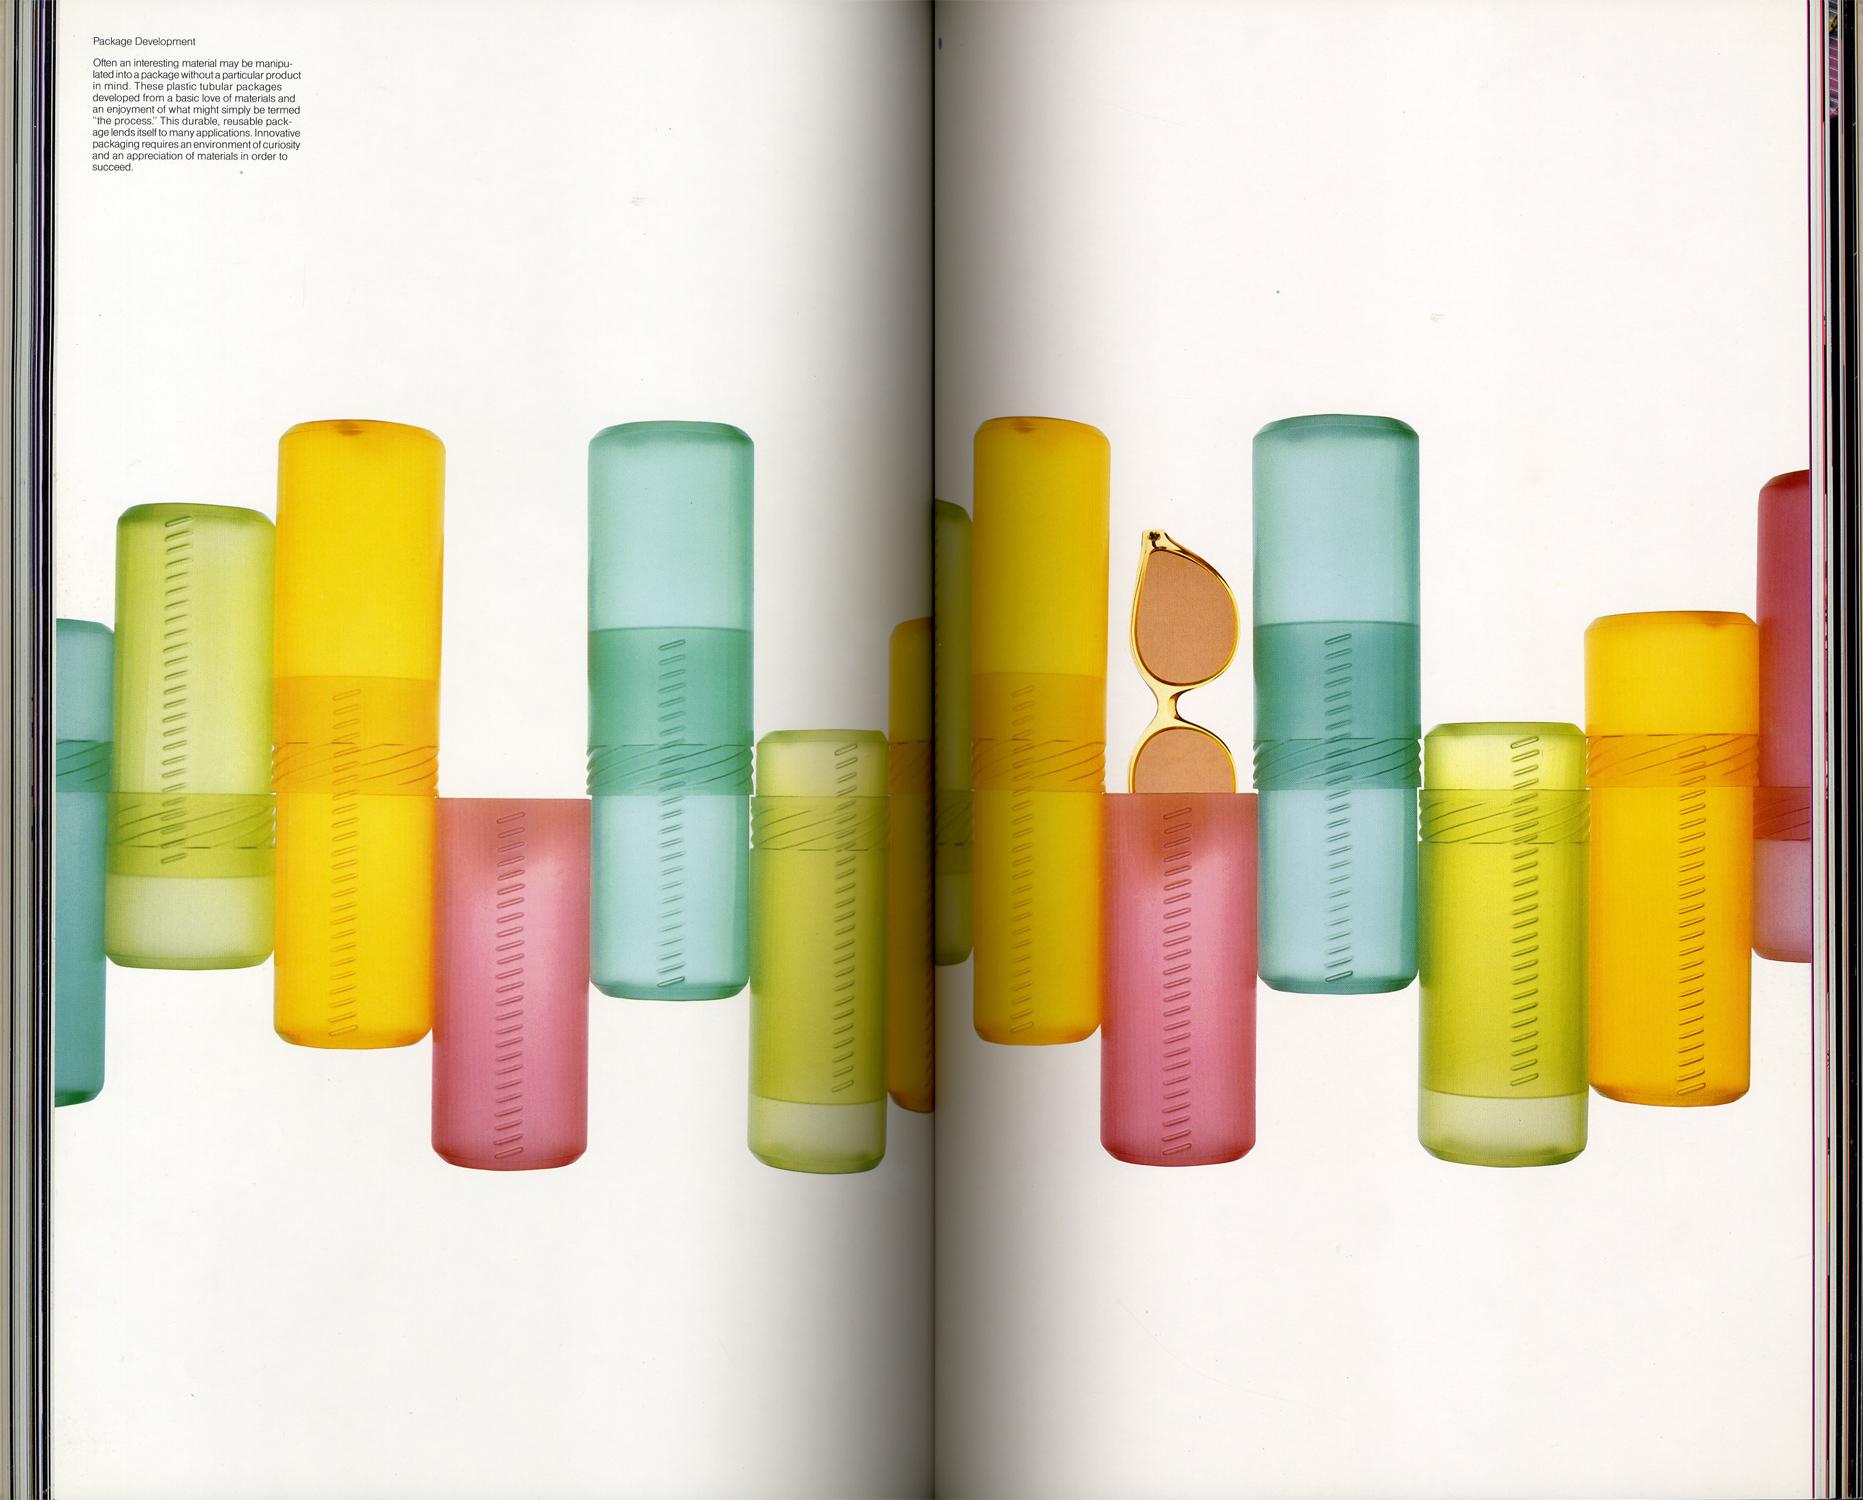 ESPRIT'S GRAPHIC WORKS 1984-1986[image4]